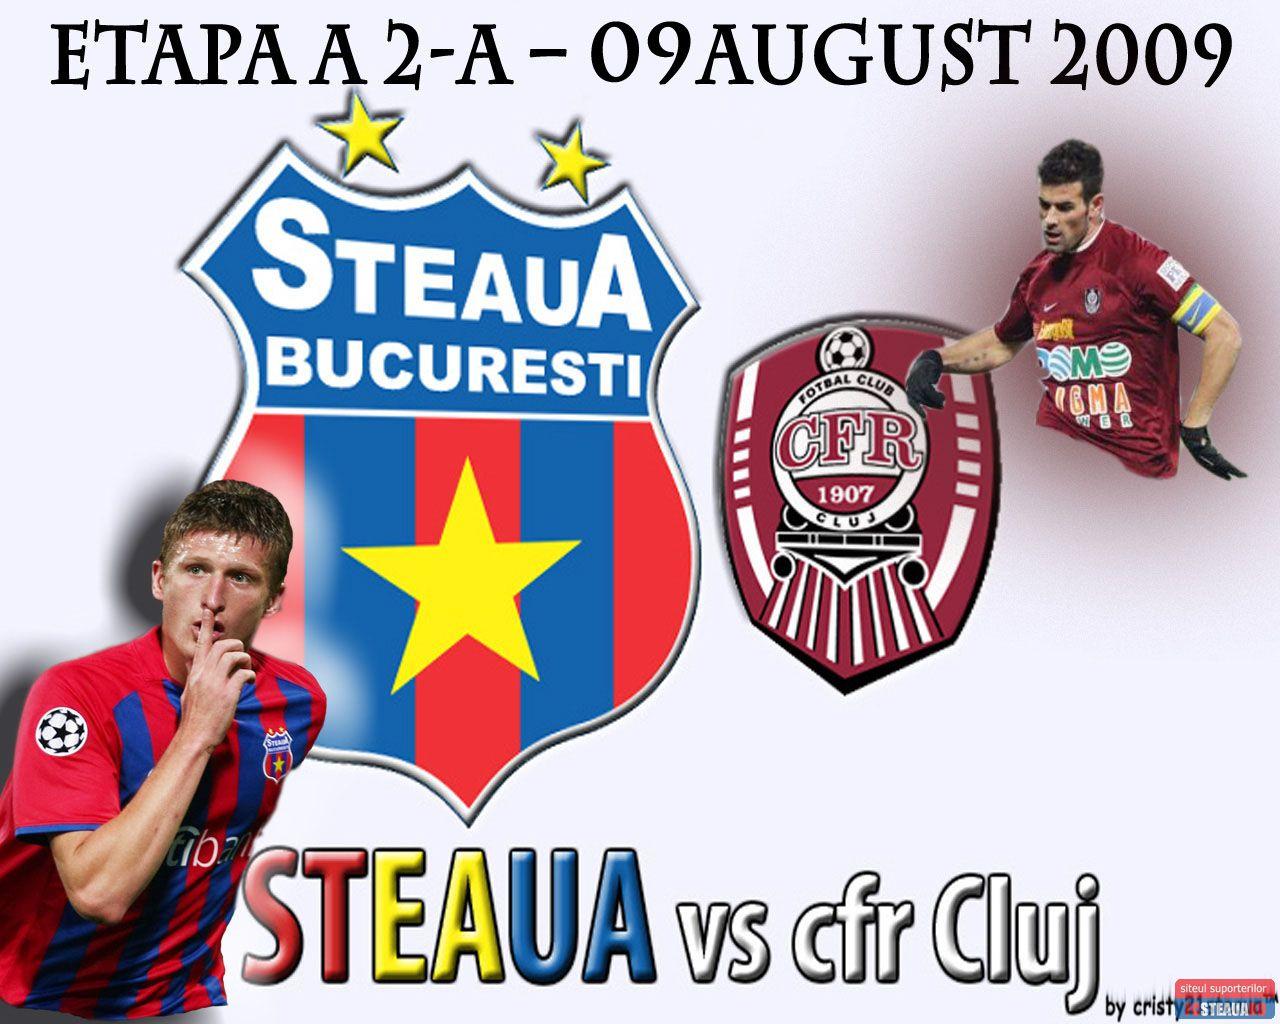 RPES 2013 Steaua 2013 - Steaua 86' - YouTube |Steaua Cfr